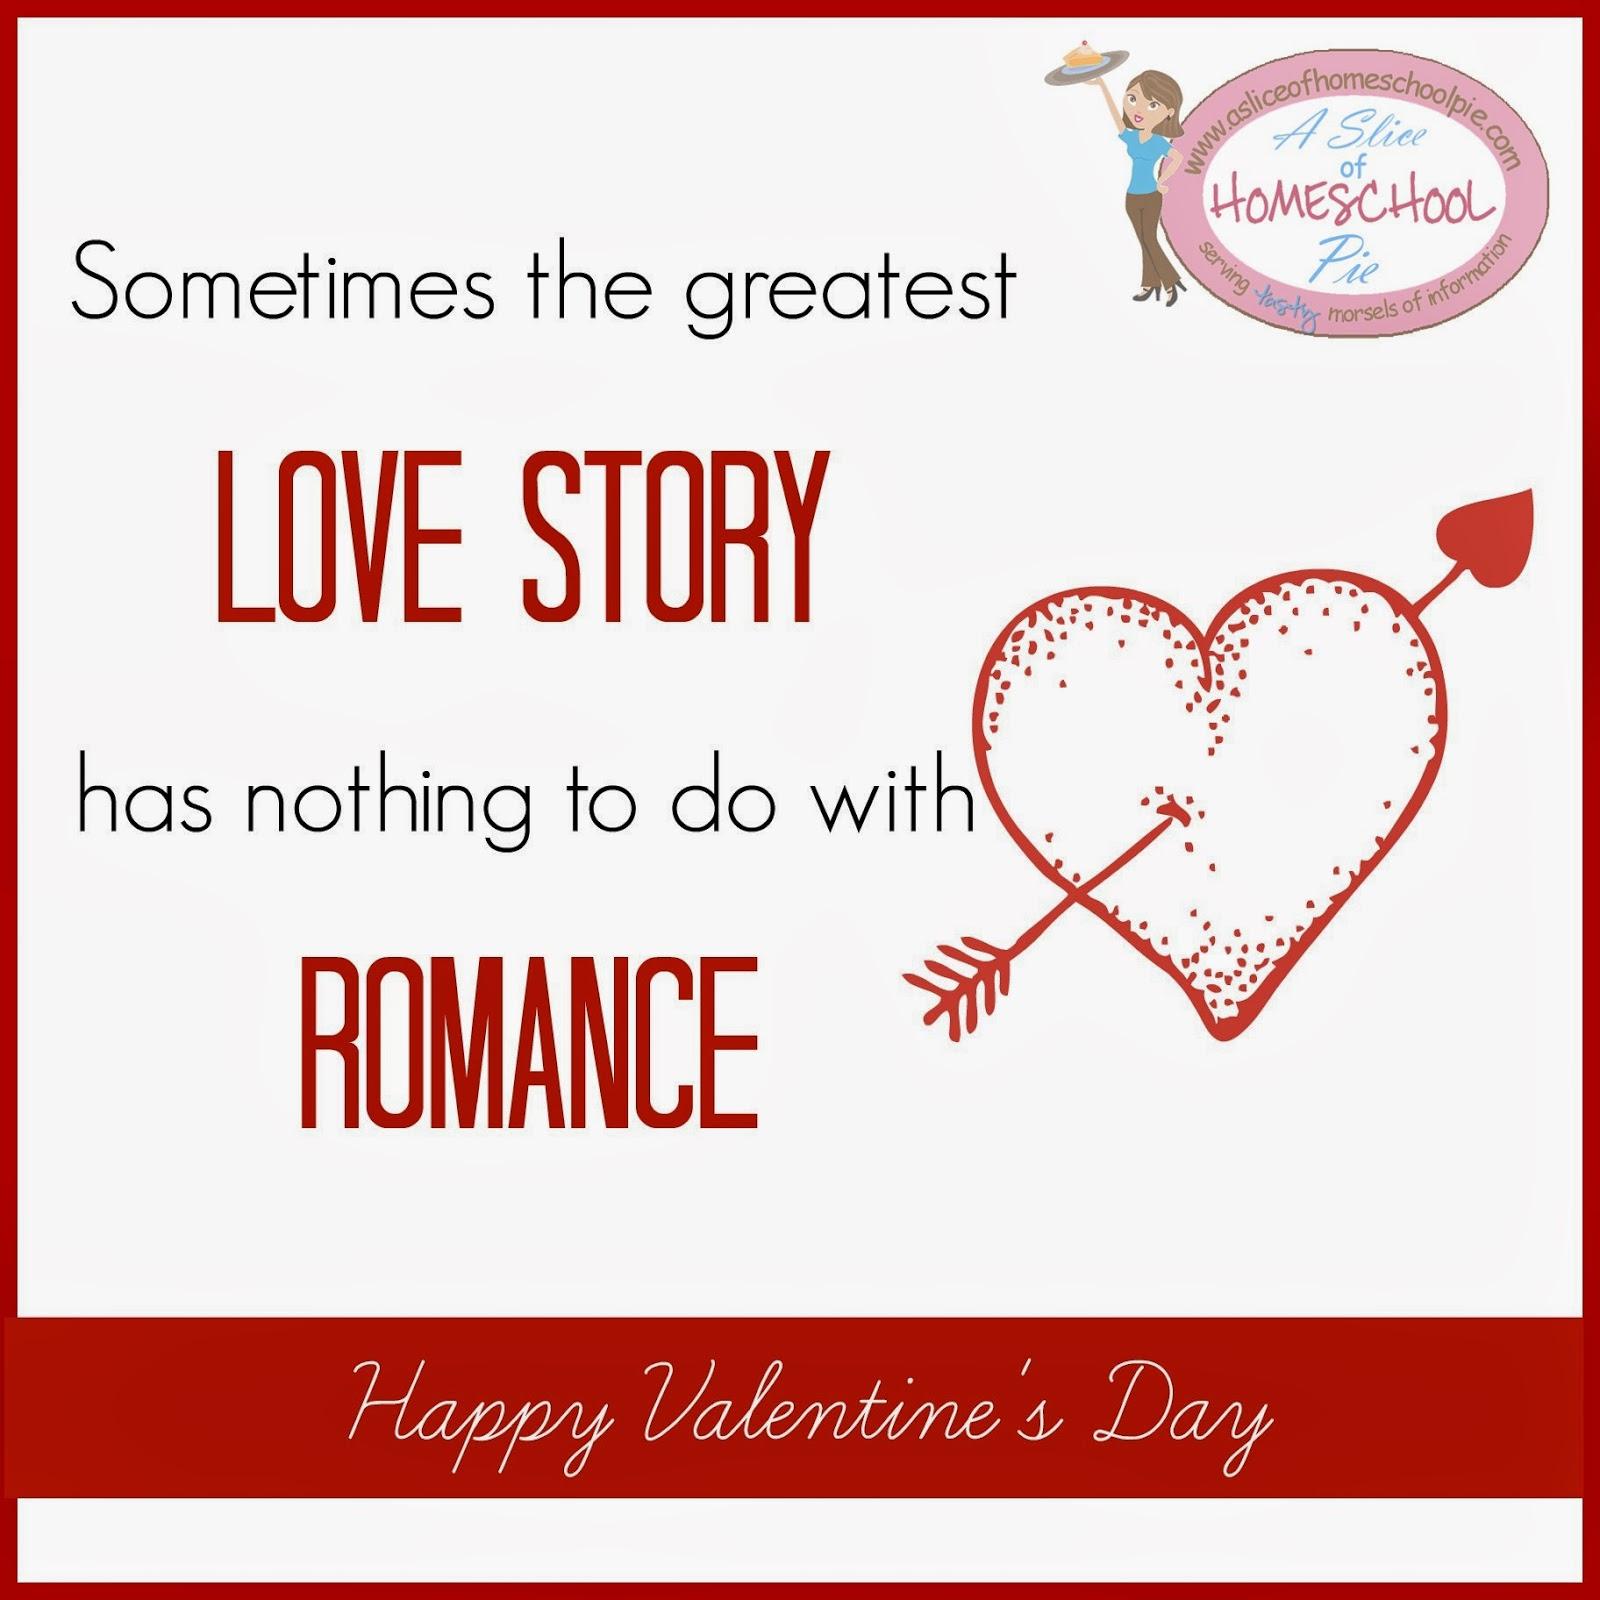 Valentine's Day Alex Bilodeau #valentinesday #alexbilodeau